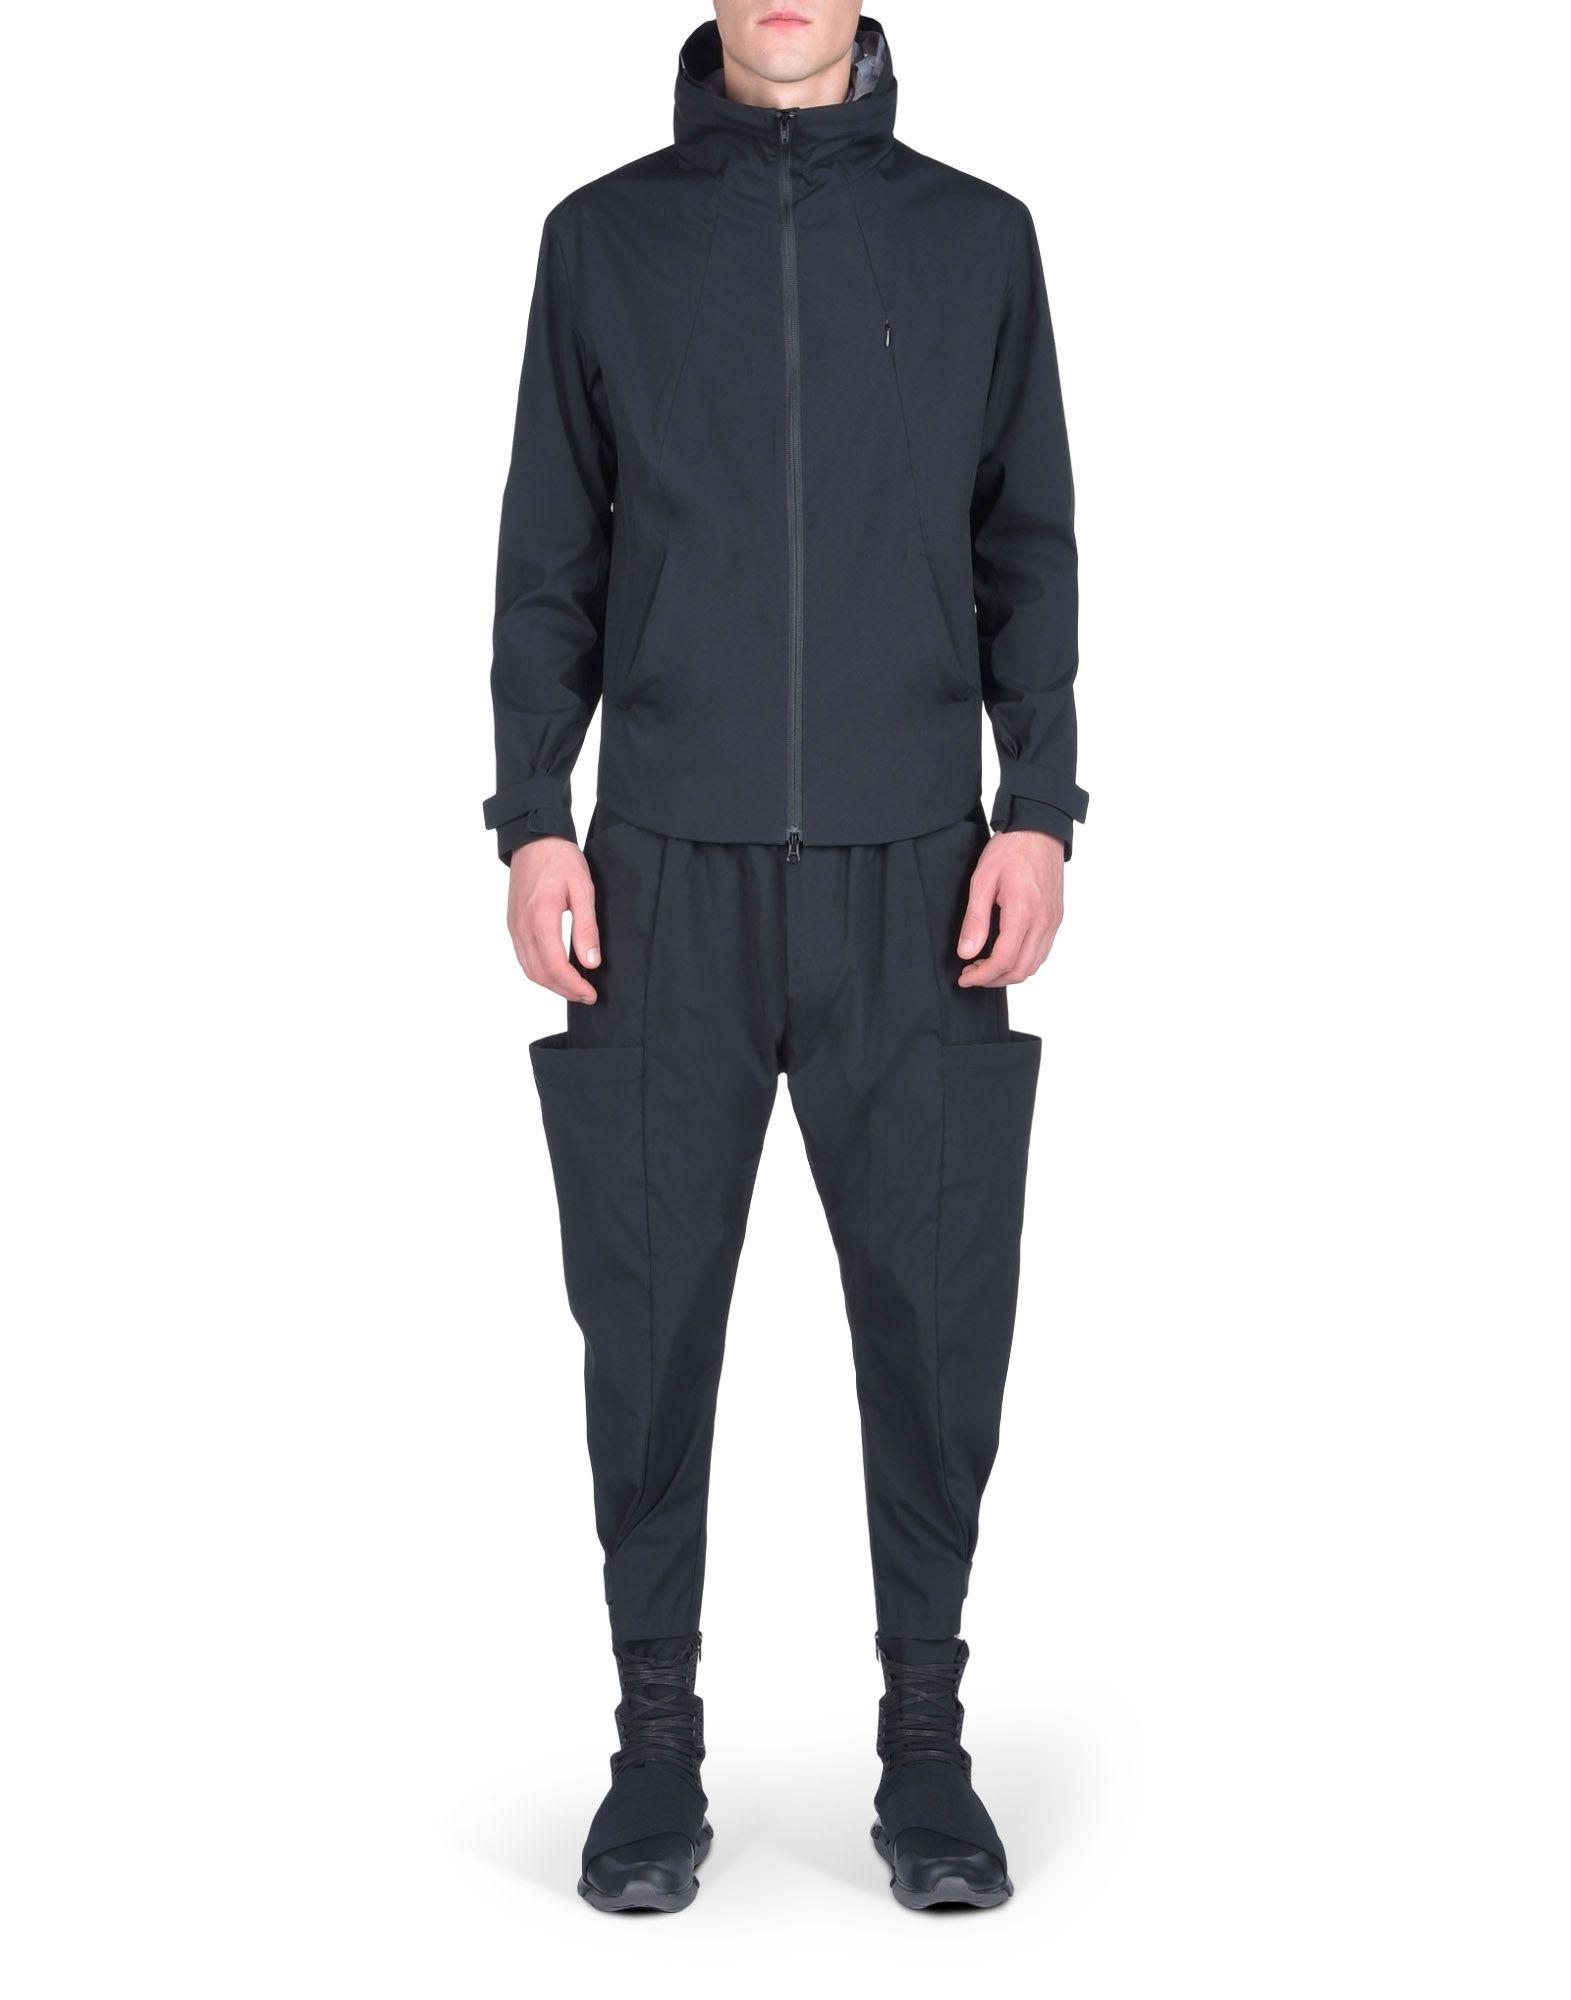 Y-3 Y-3 MINIMALIST PANT Casual trouser Man d